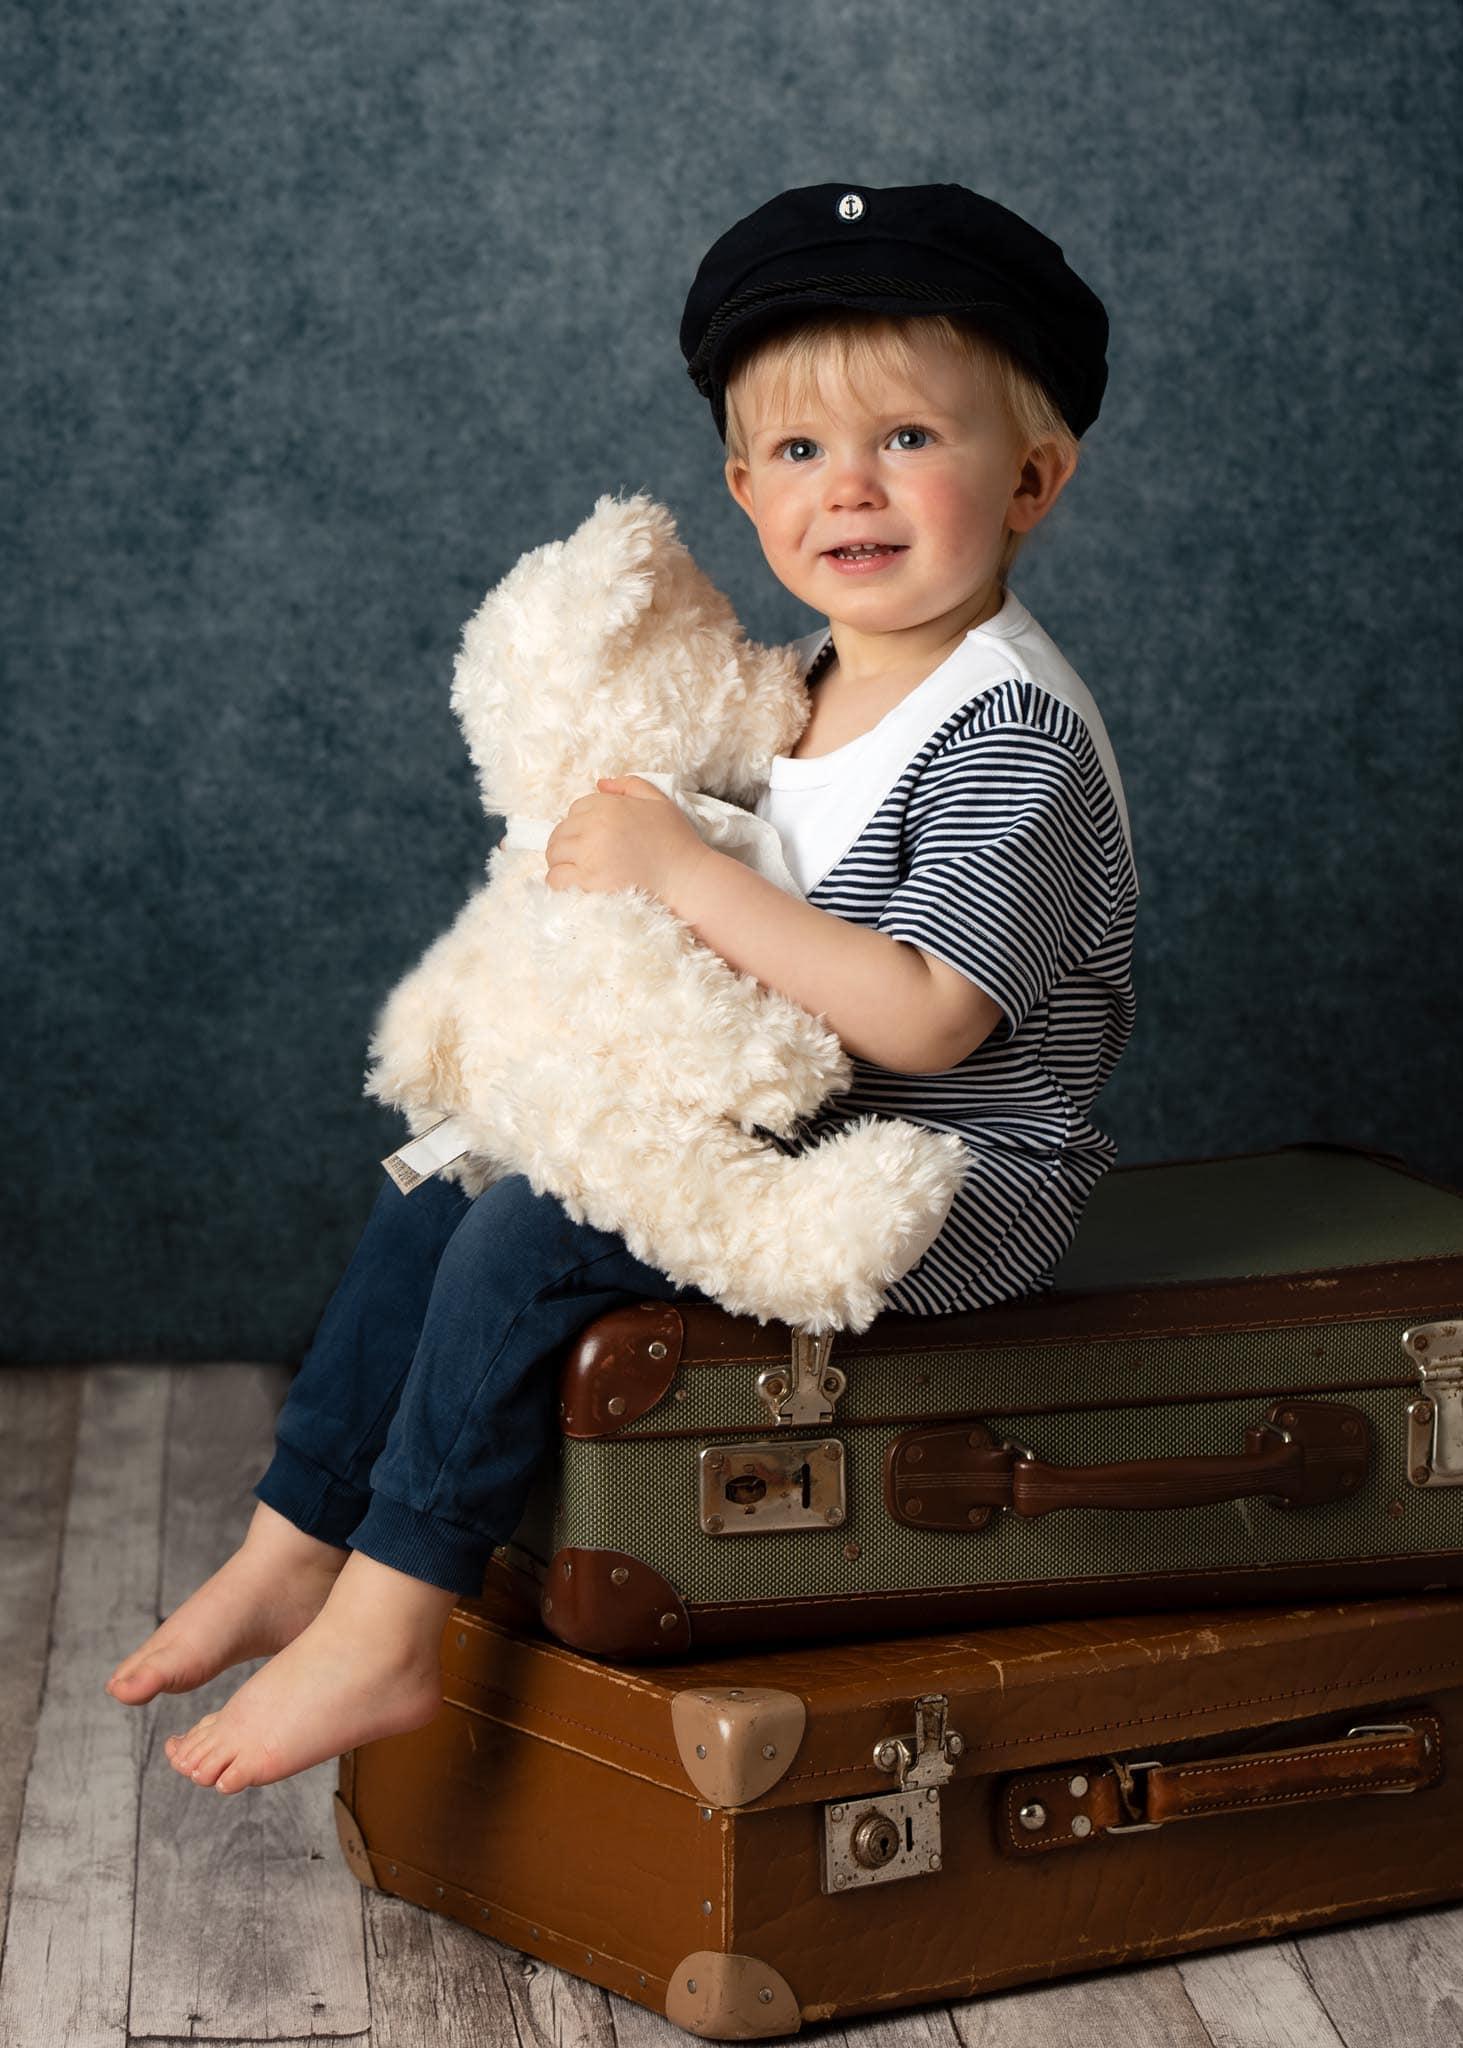 Barnfoto i studio, 2 årskort med nalle